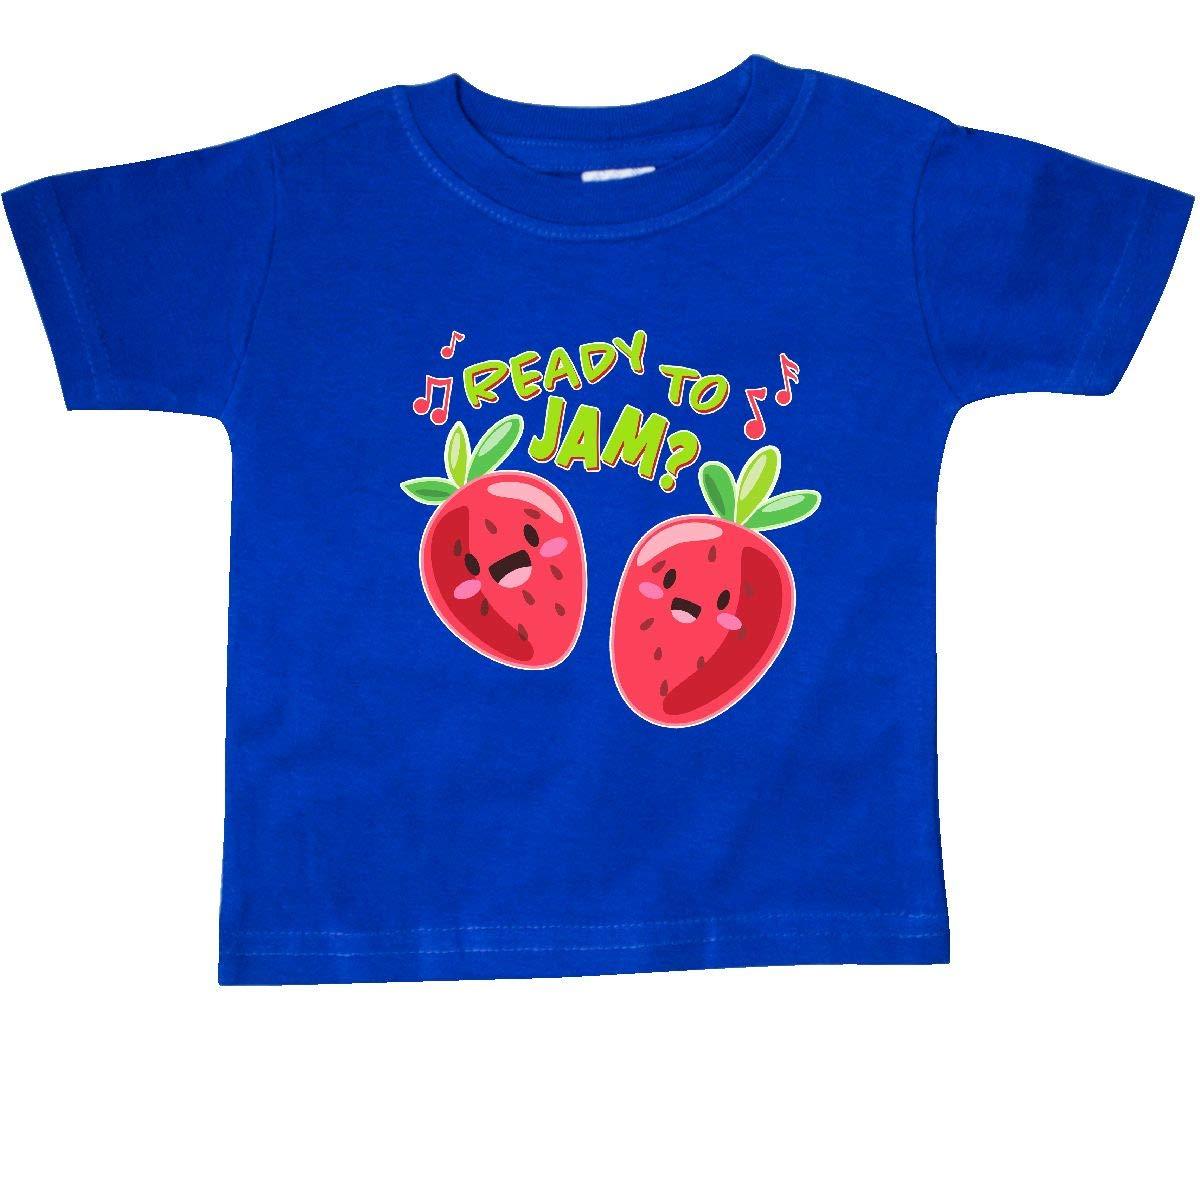 Fun Strawberries Baby T-Shirt inktastic Ready to Jam